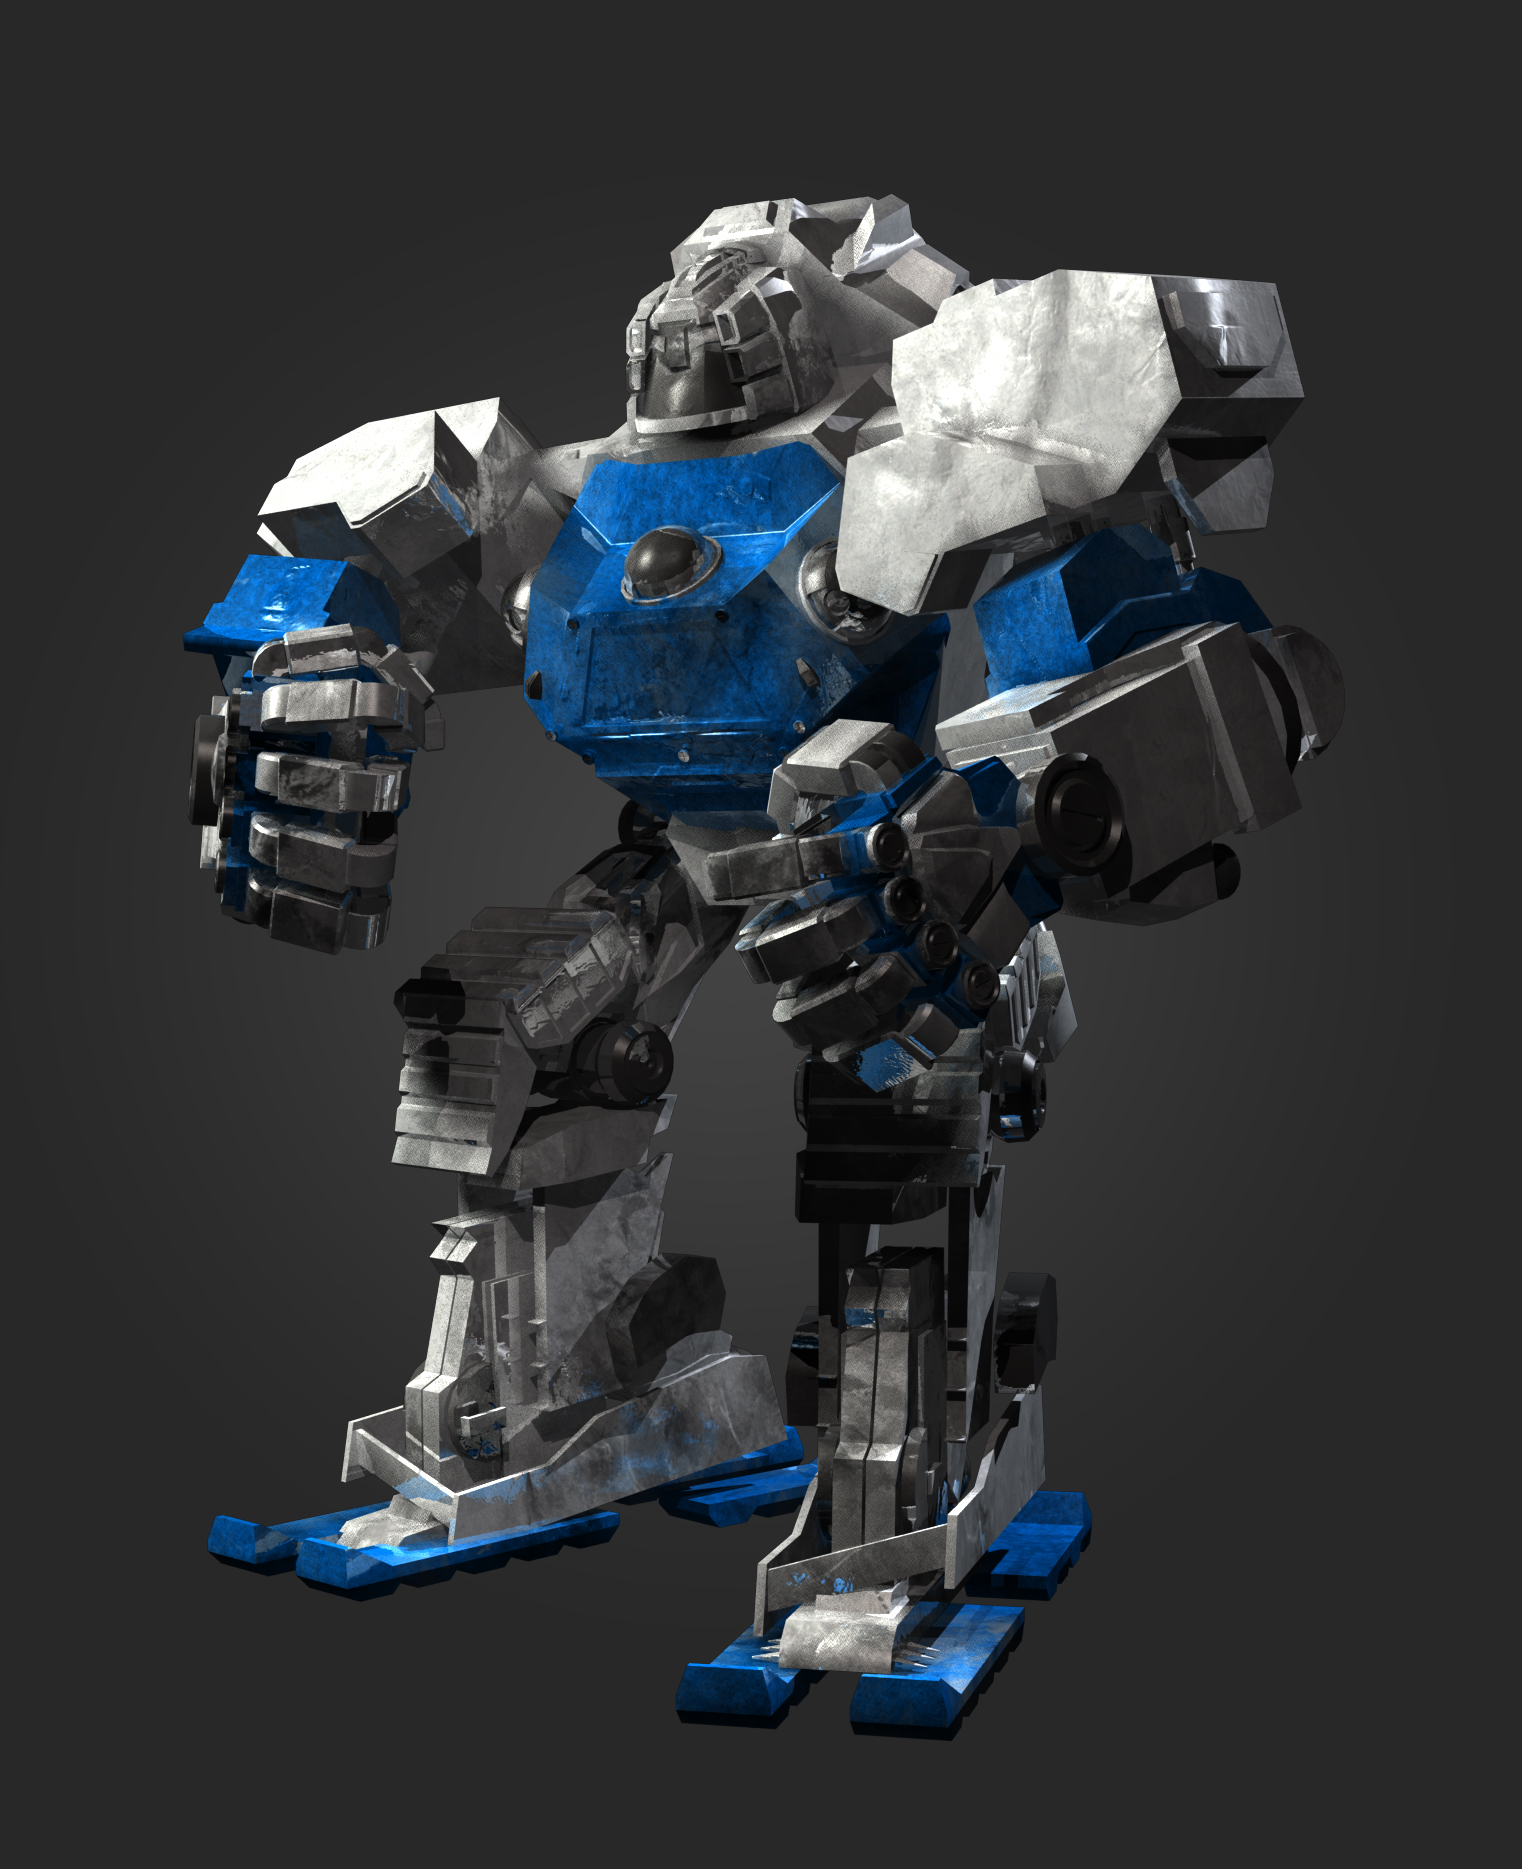 Giant Robot Clash